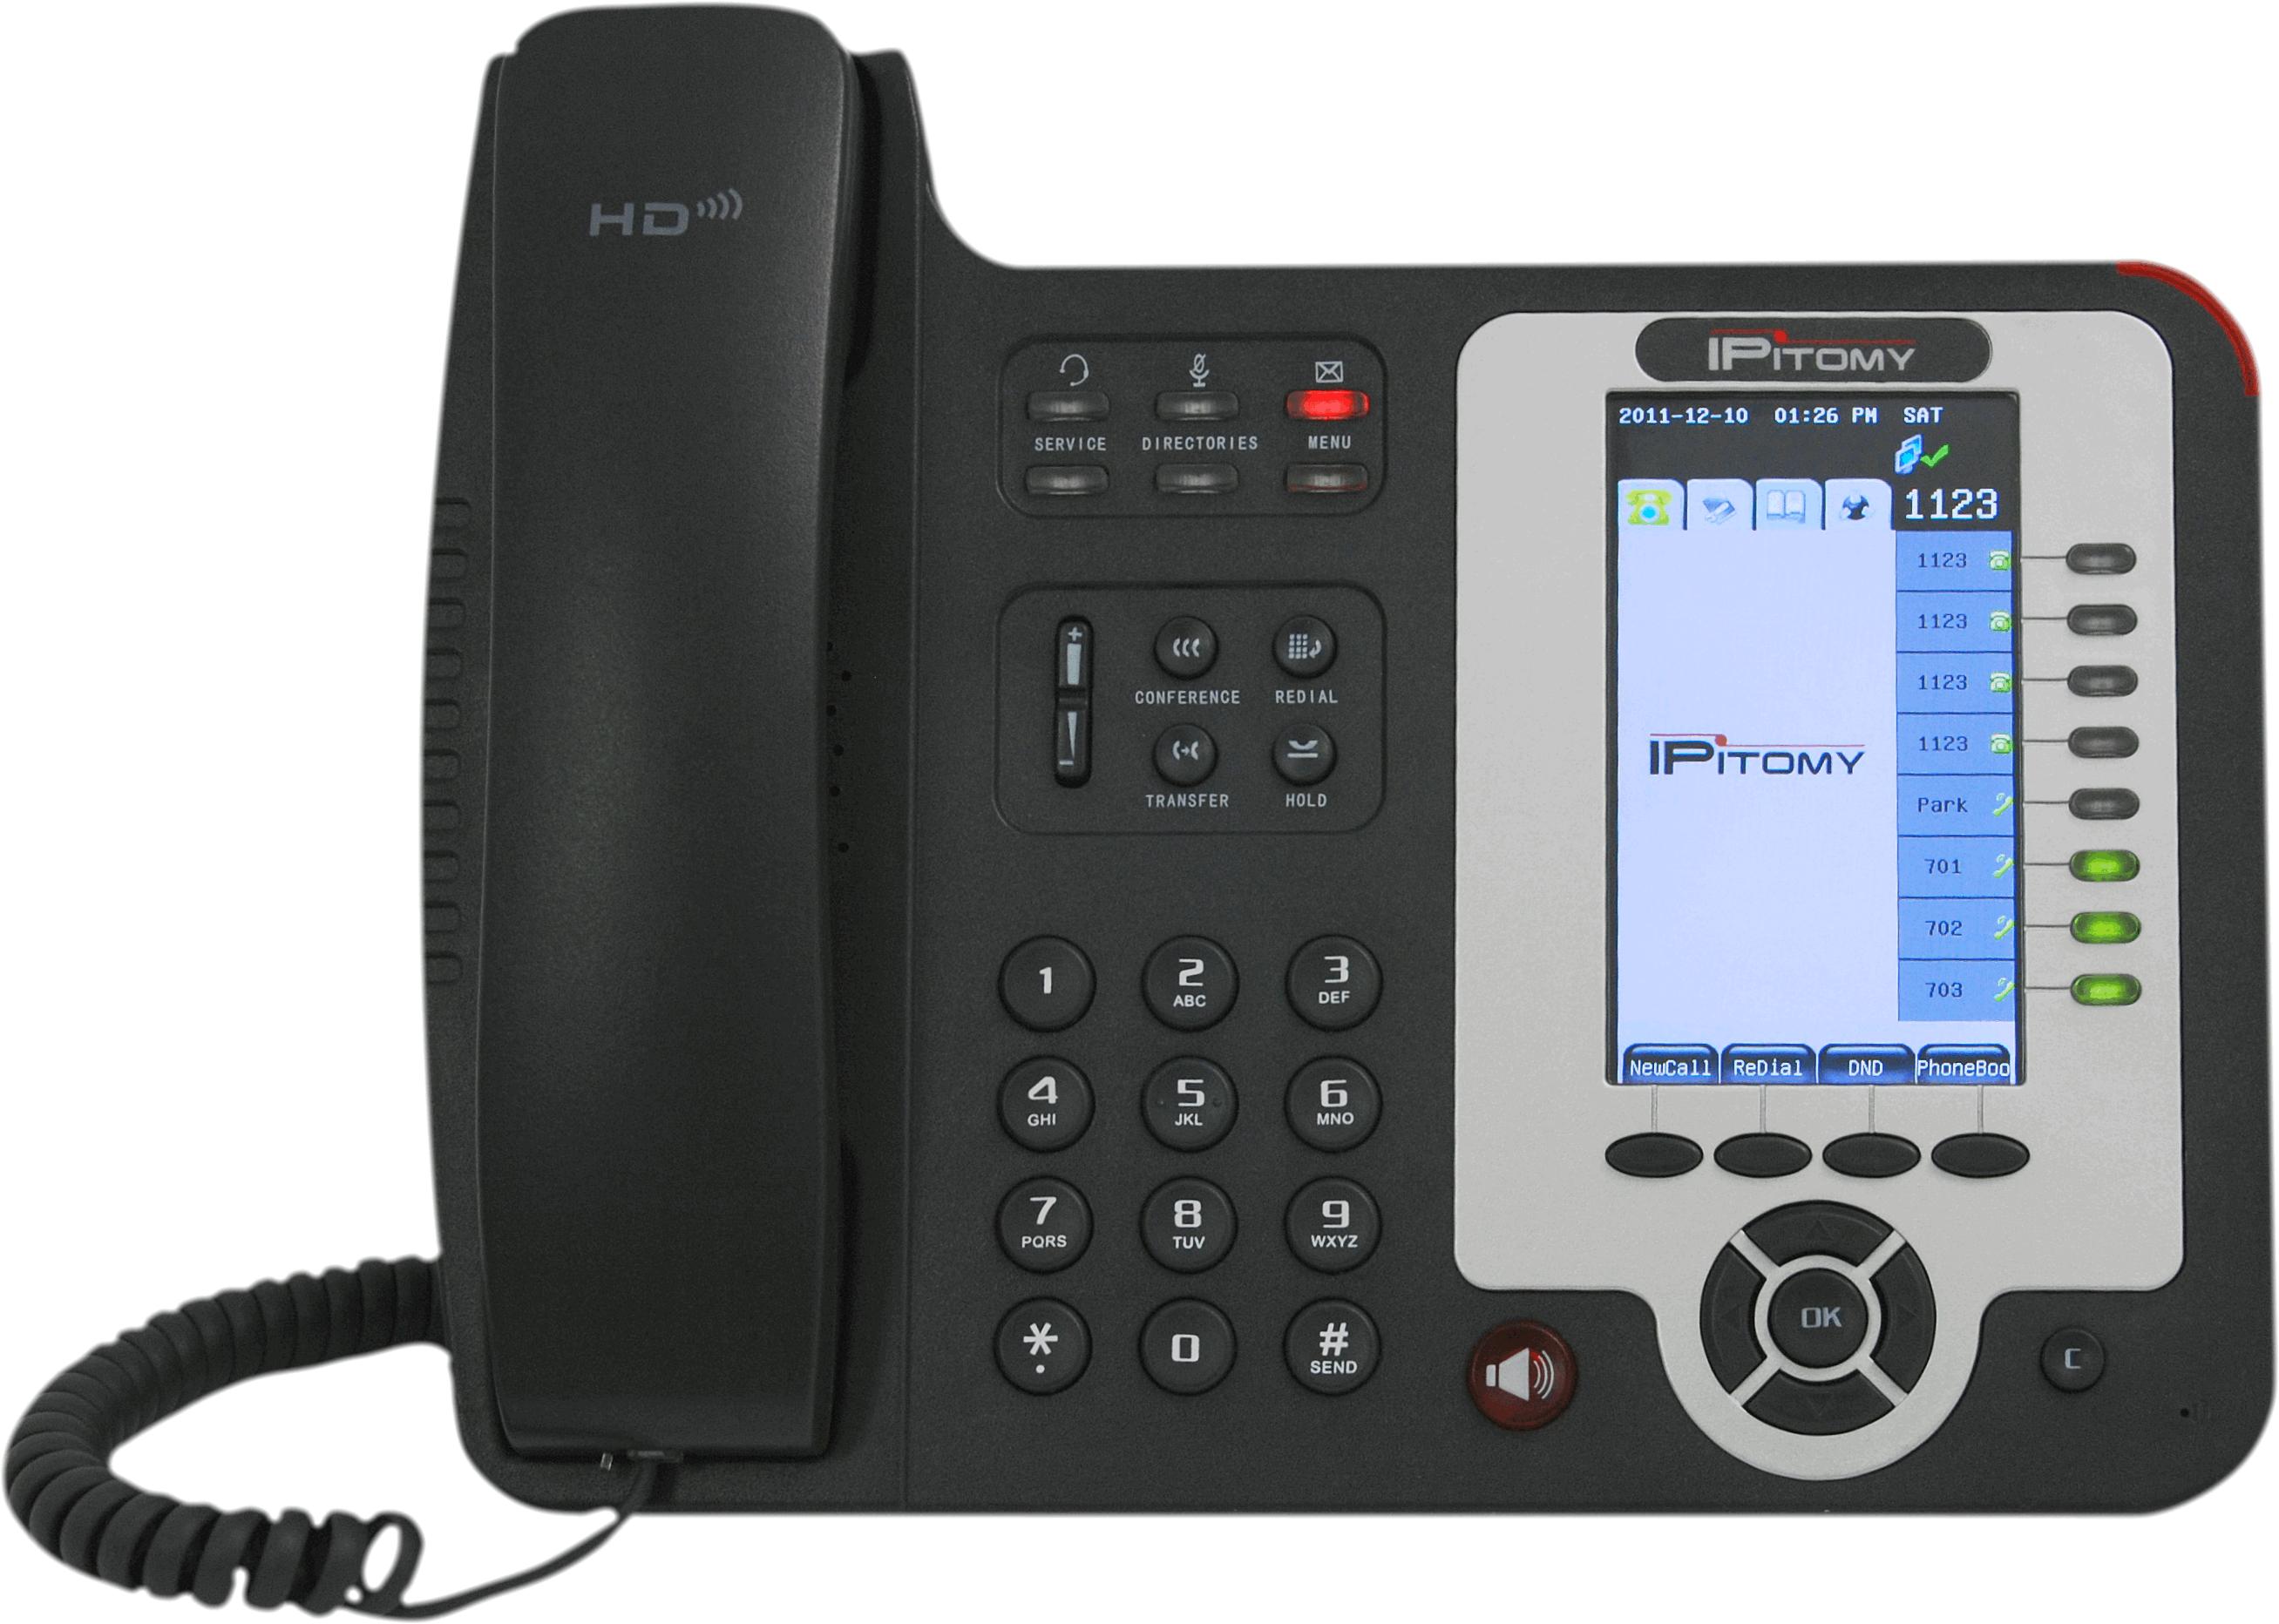 IP620